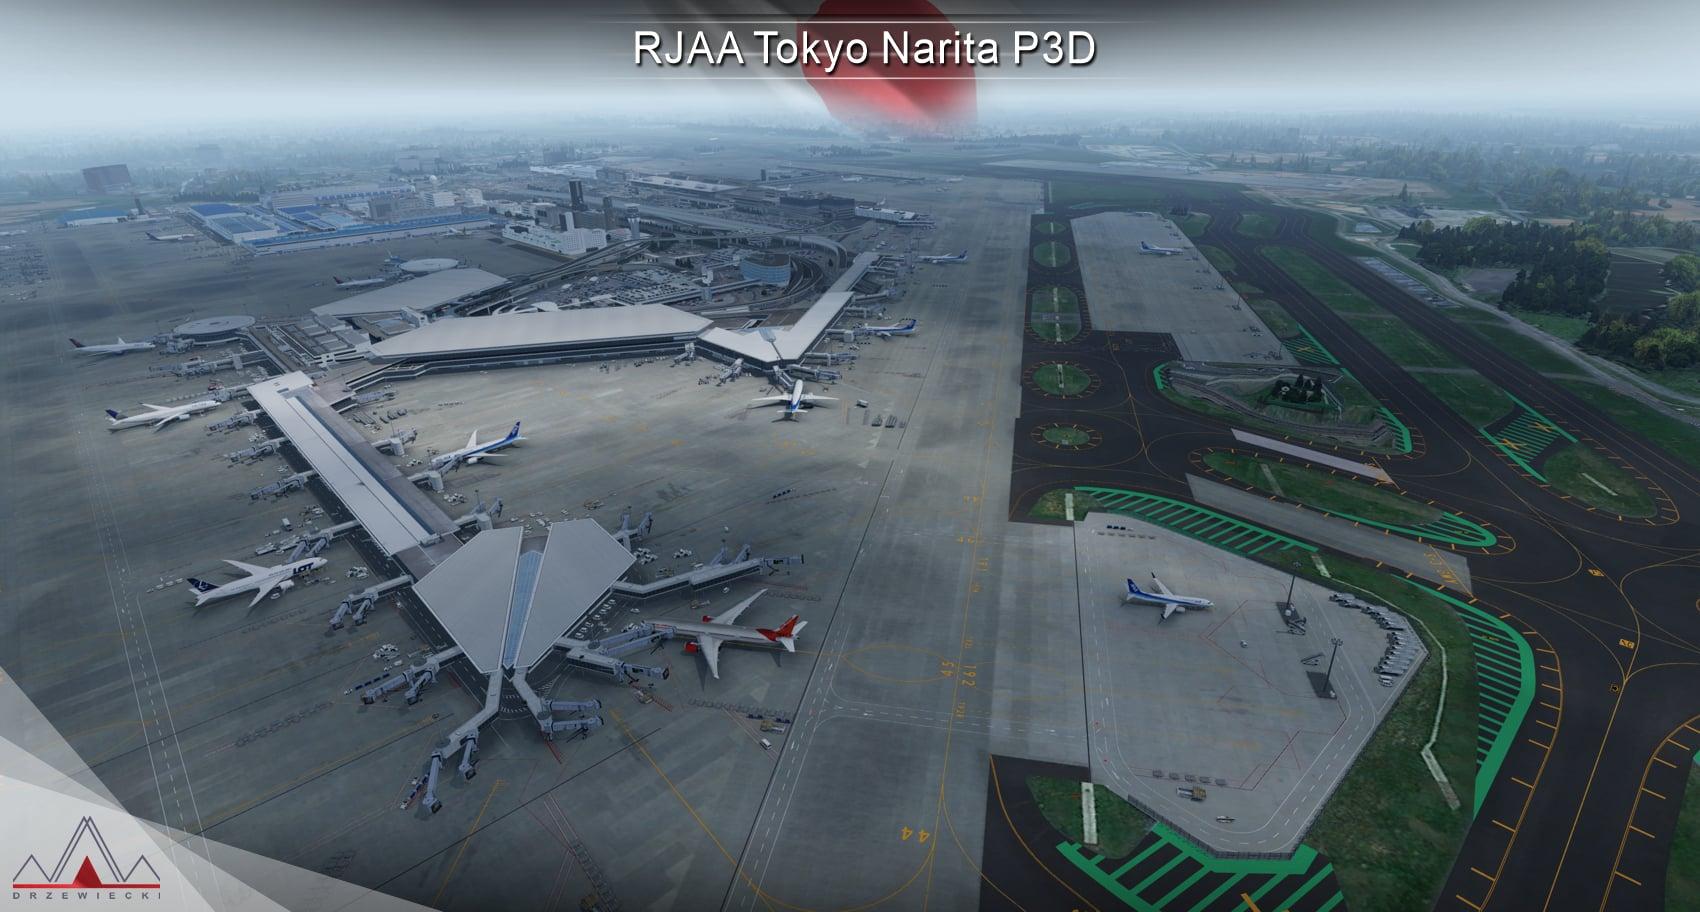 Drzewiecki Design – Narita P3D Update 1.1